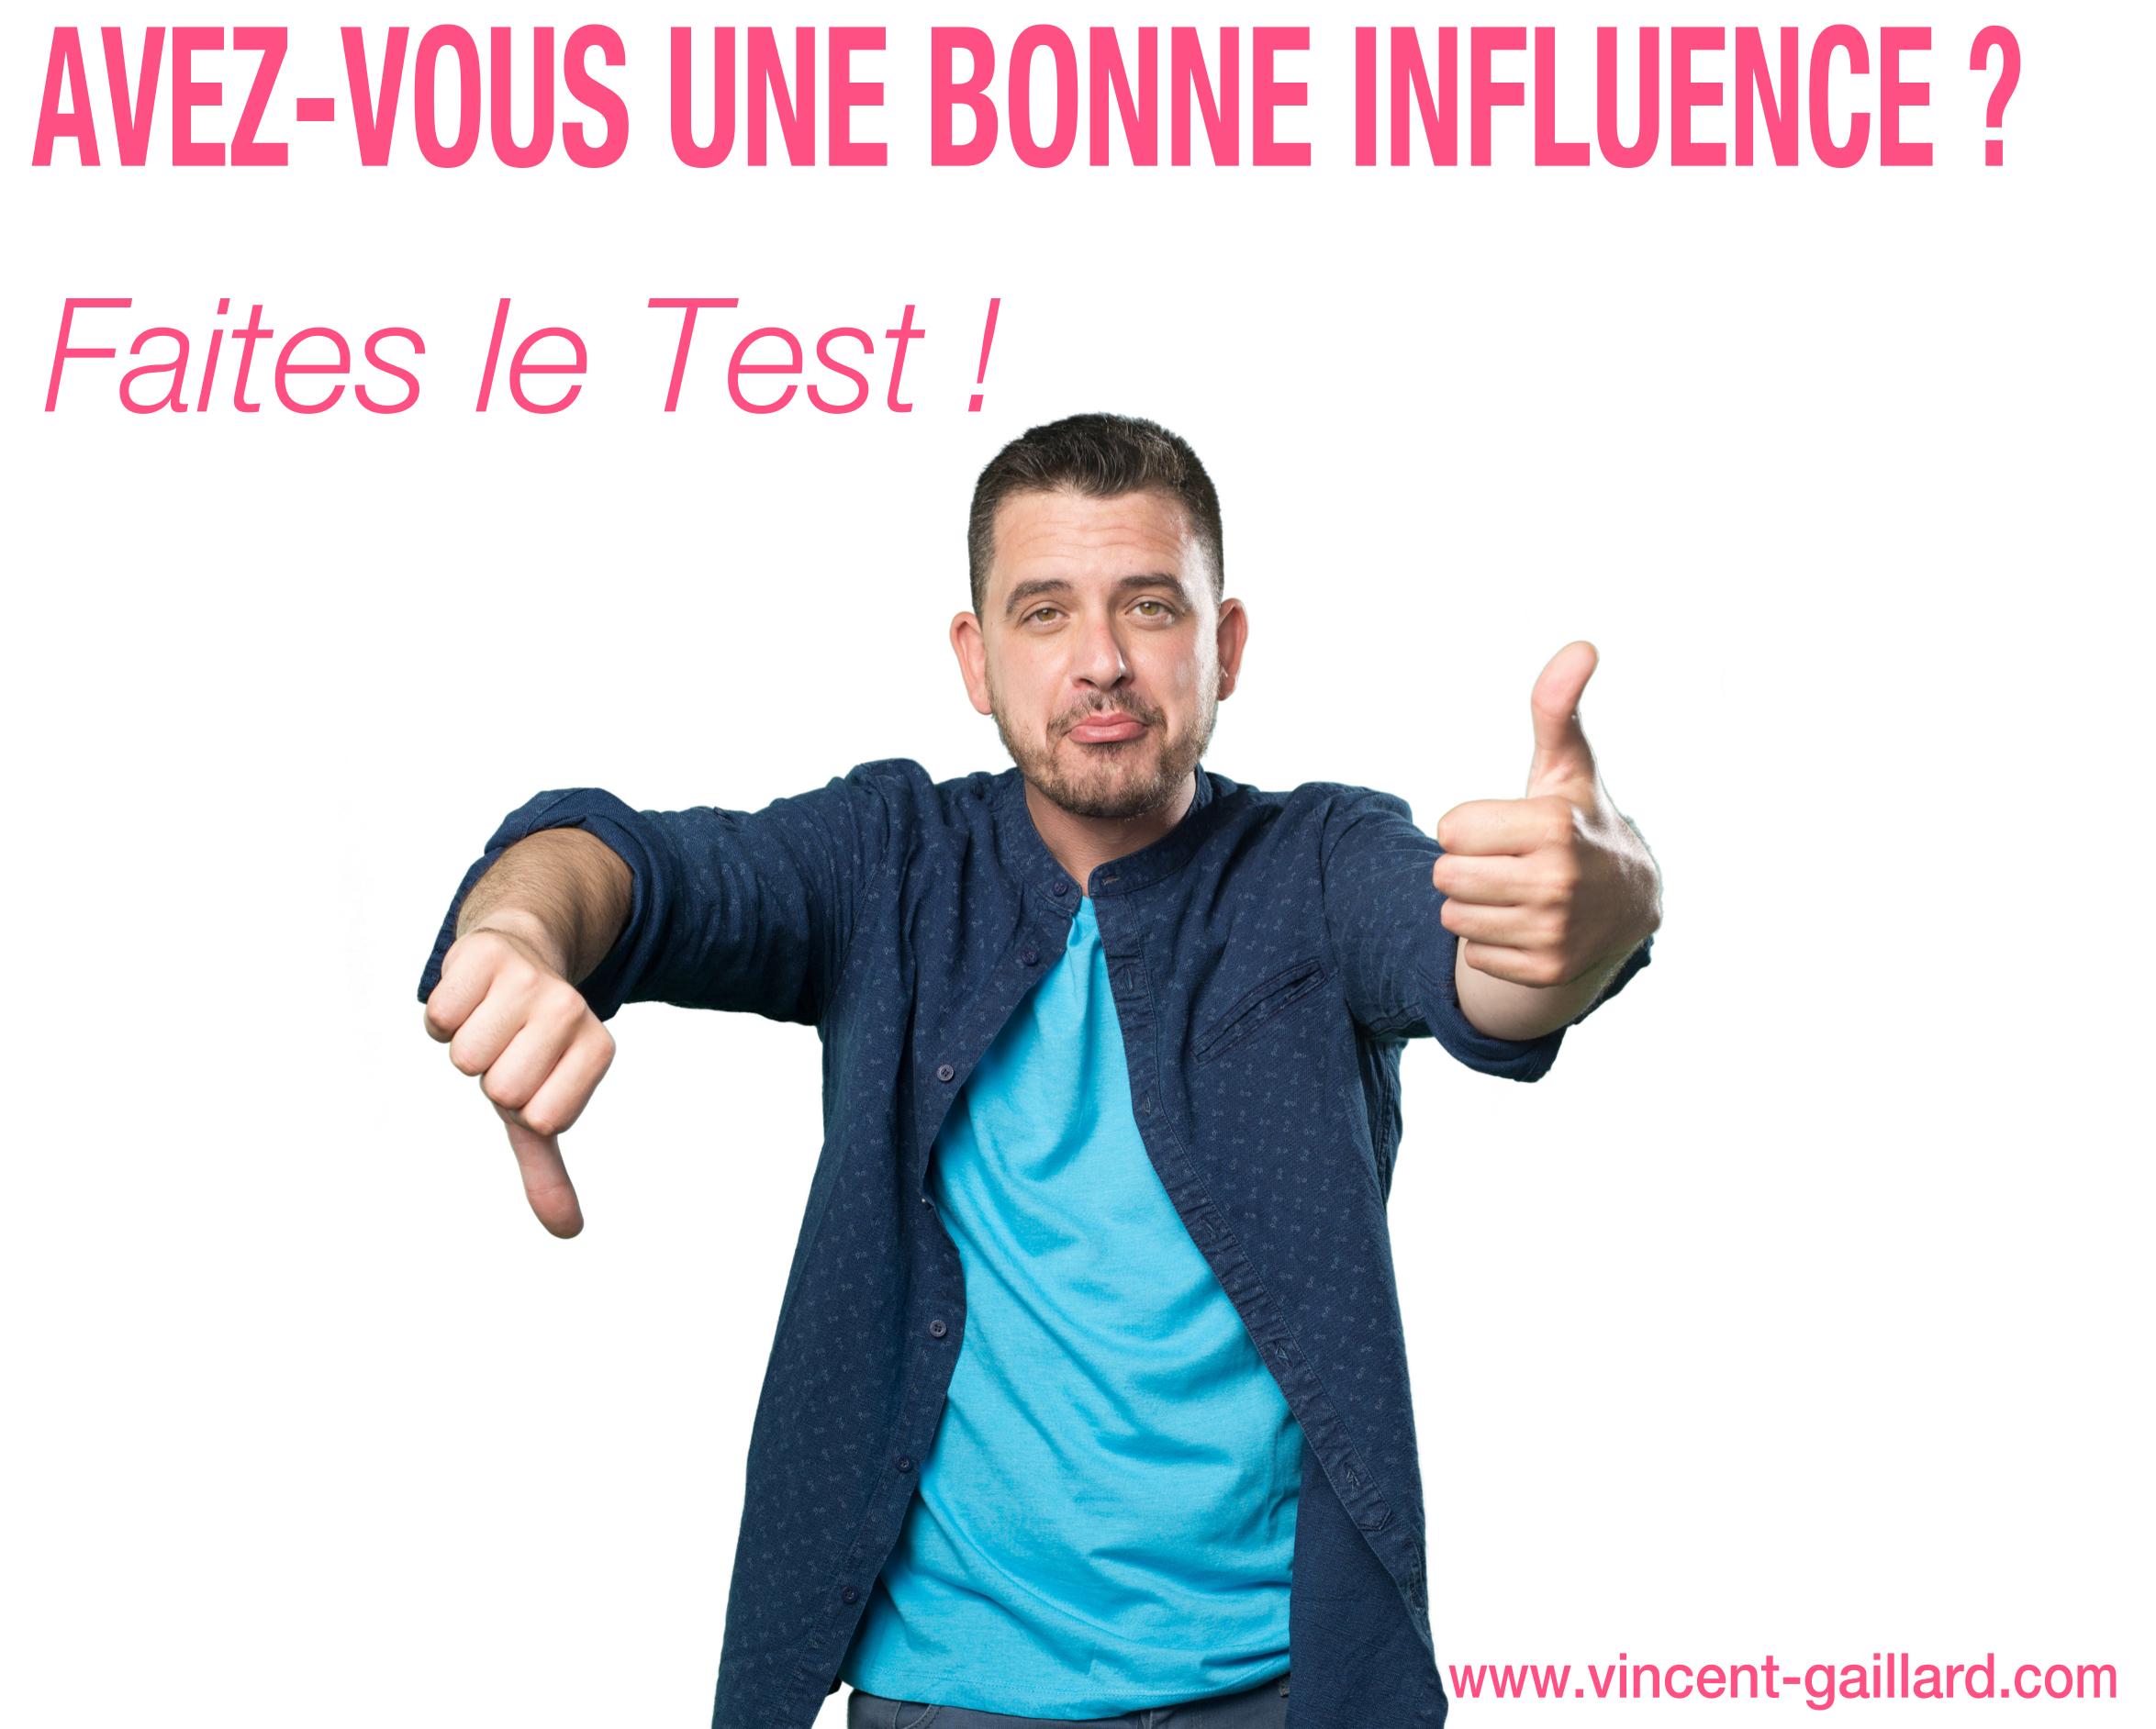 Test Bonne influence